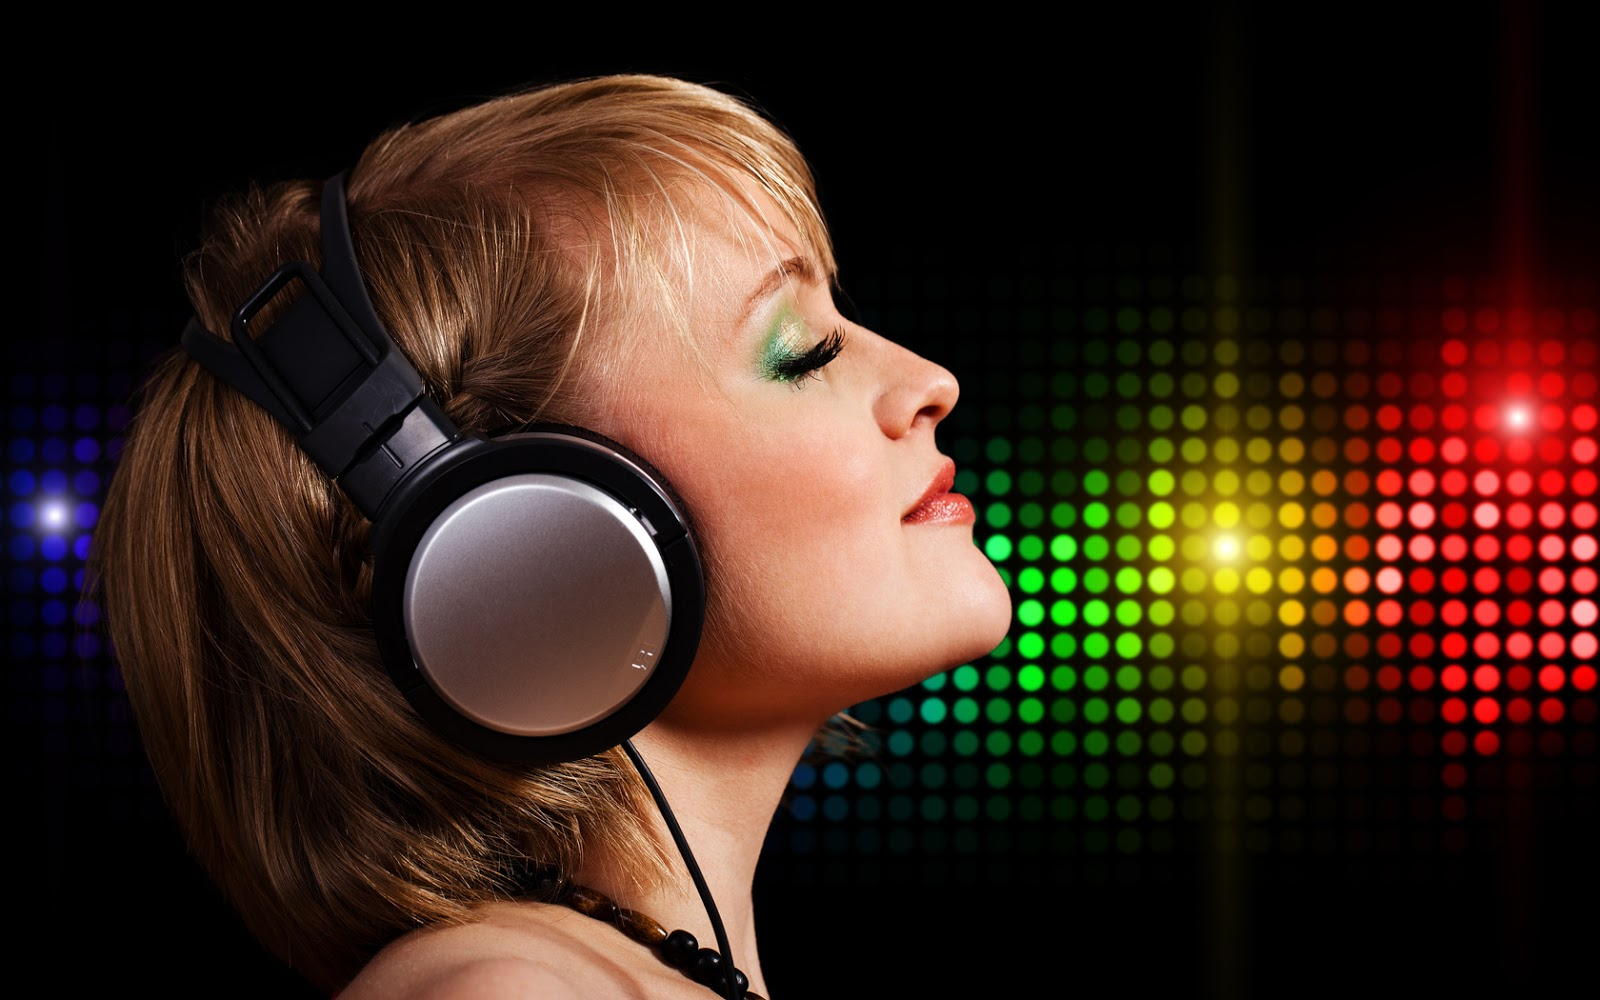 http://4.bp.blogspot.com/-S3W-QoG_83k/UOLz2uIZdbI/AAAAAAAAB4U/veWxXz3rC-g/s1600/Girls+HD+Desktop+Wallpaper.jpg